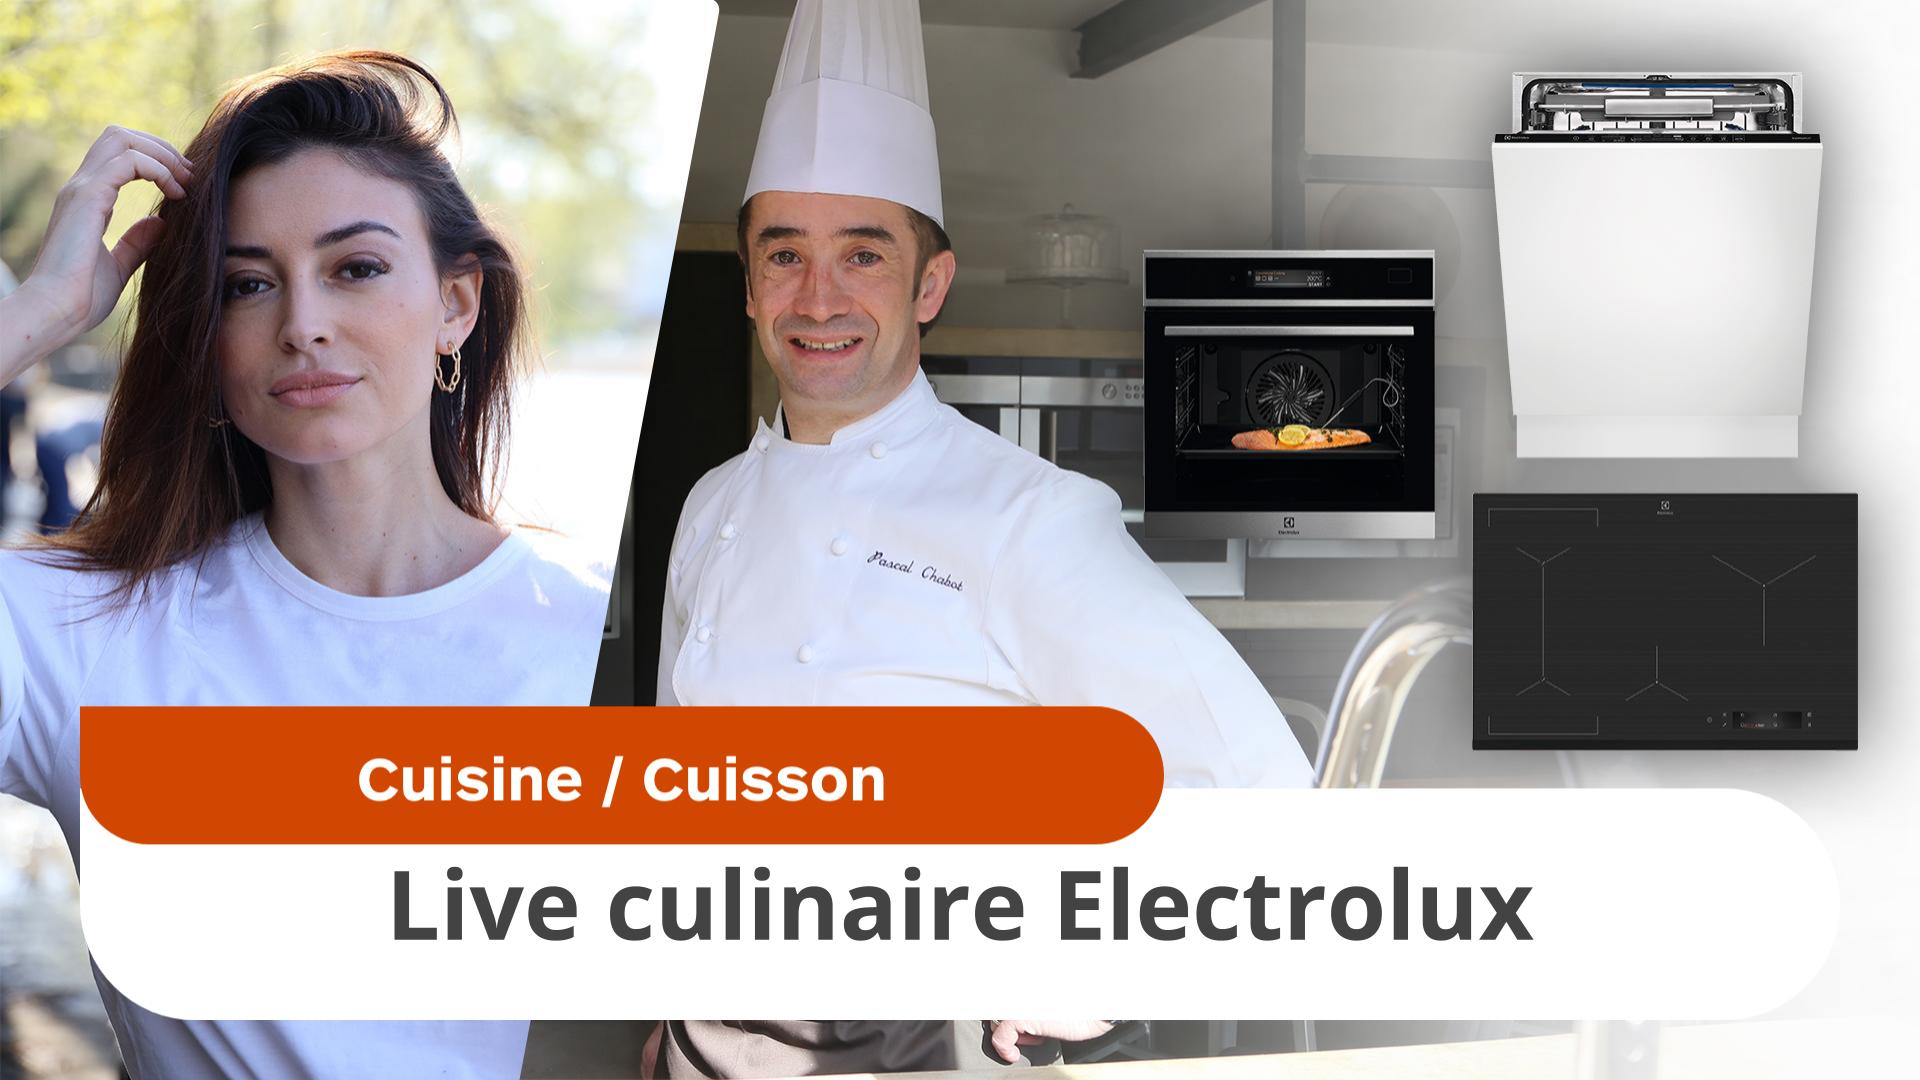 https://www.boulanger.com/ref/1125845#caast-open